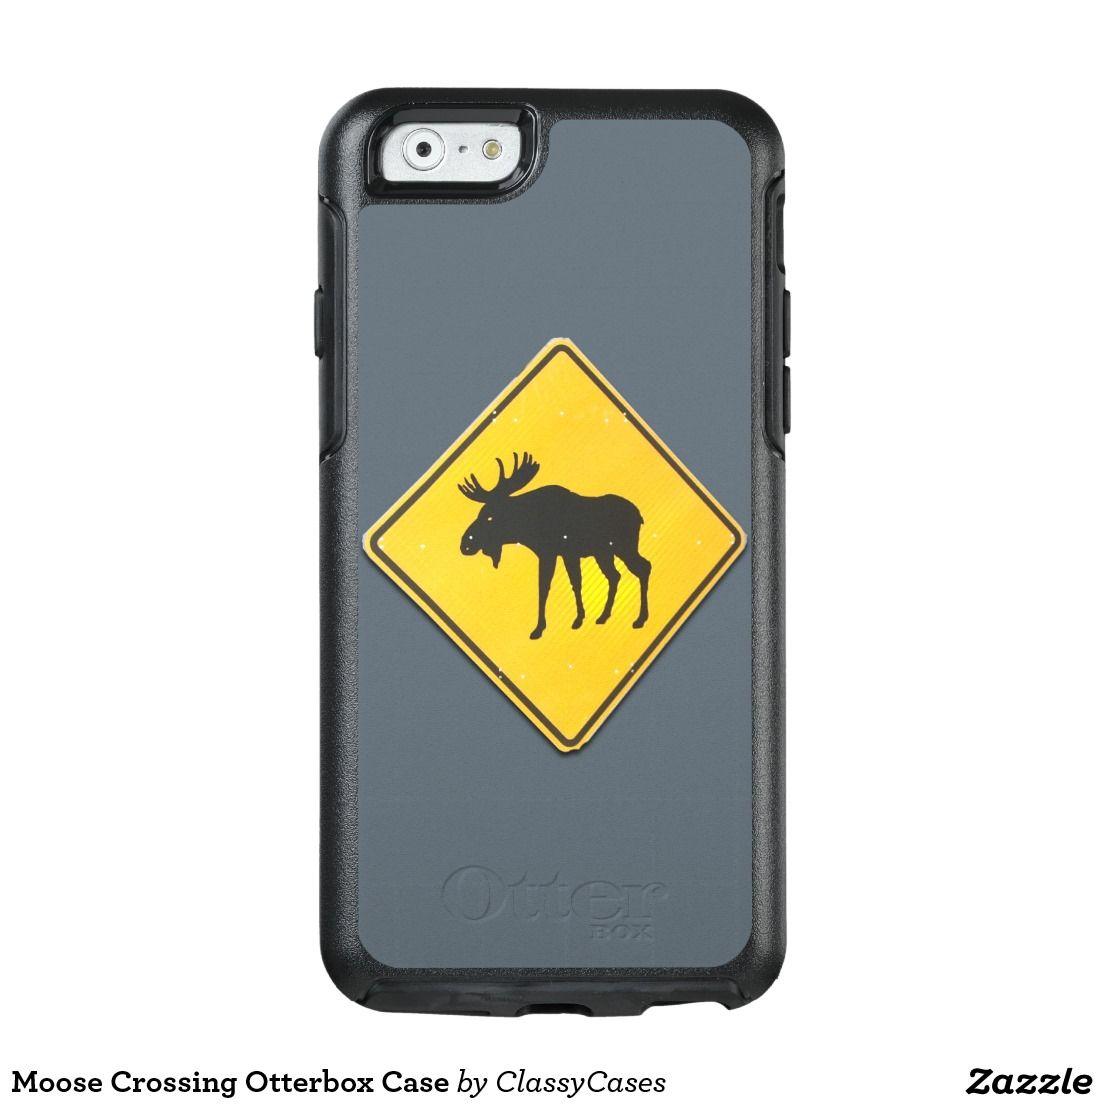 Moose Crossing Otterbox Case